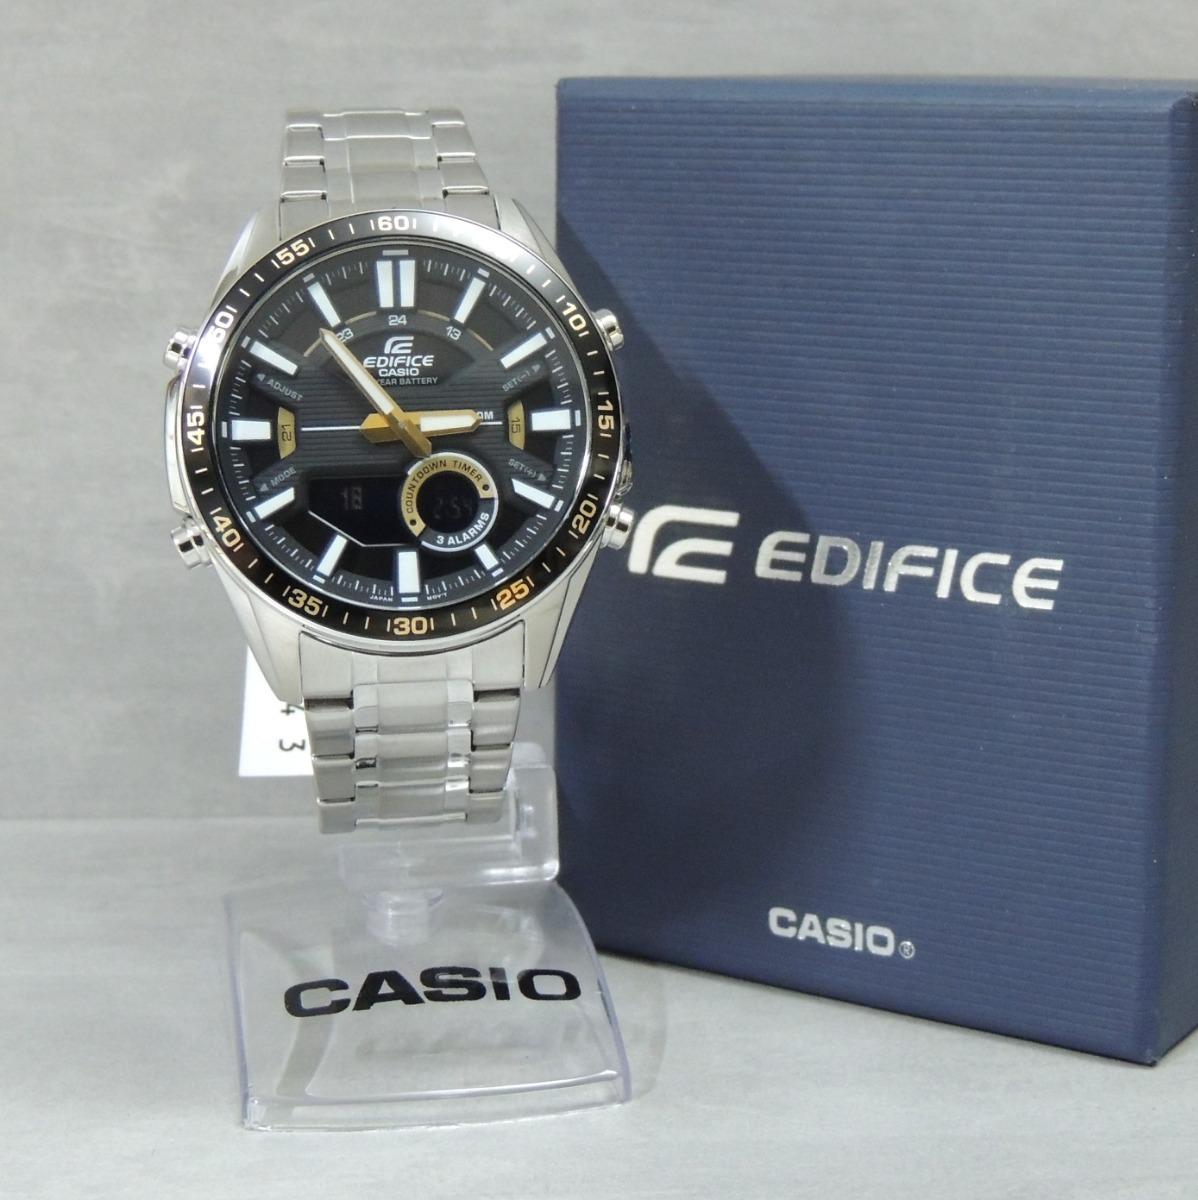 4fd539c67ba relógio casio edifice efv-c100d-1bvdf cronógrafo. Carregando zoom.